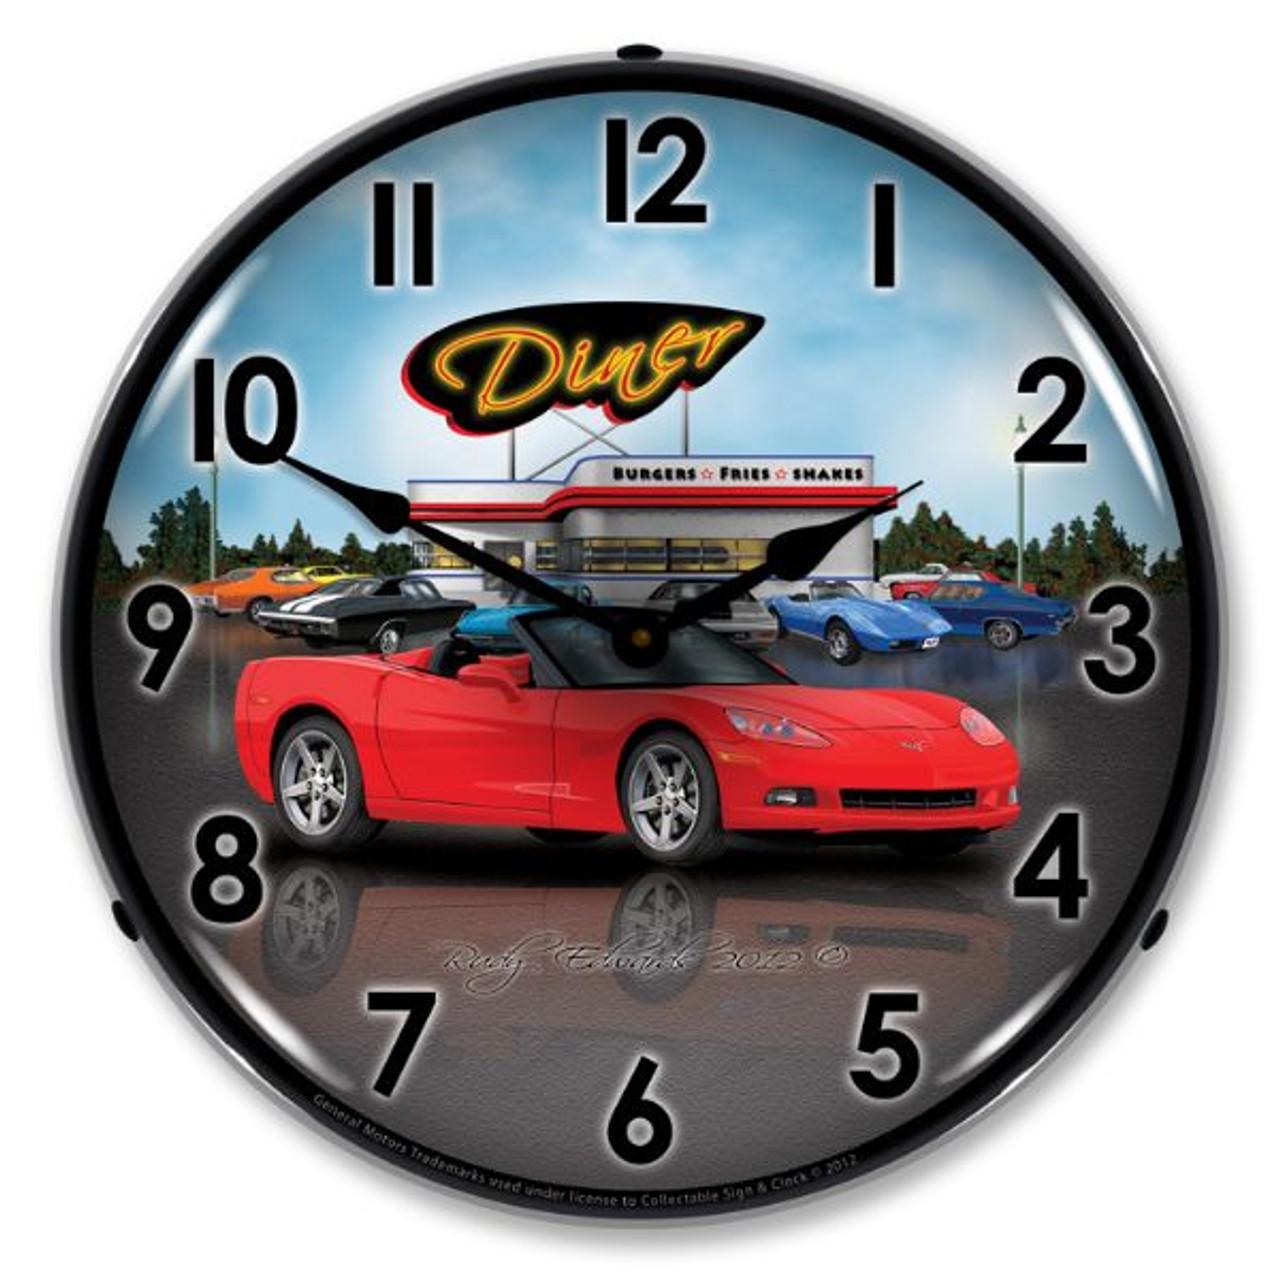 Retro C6 Corvette Convertible Diner Lighted Wall Clock